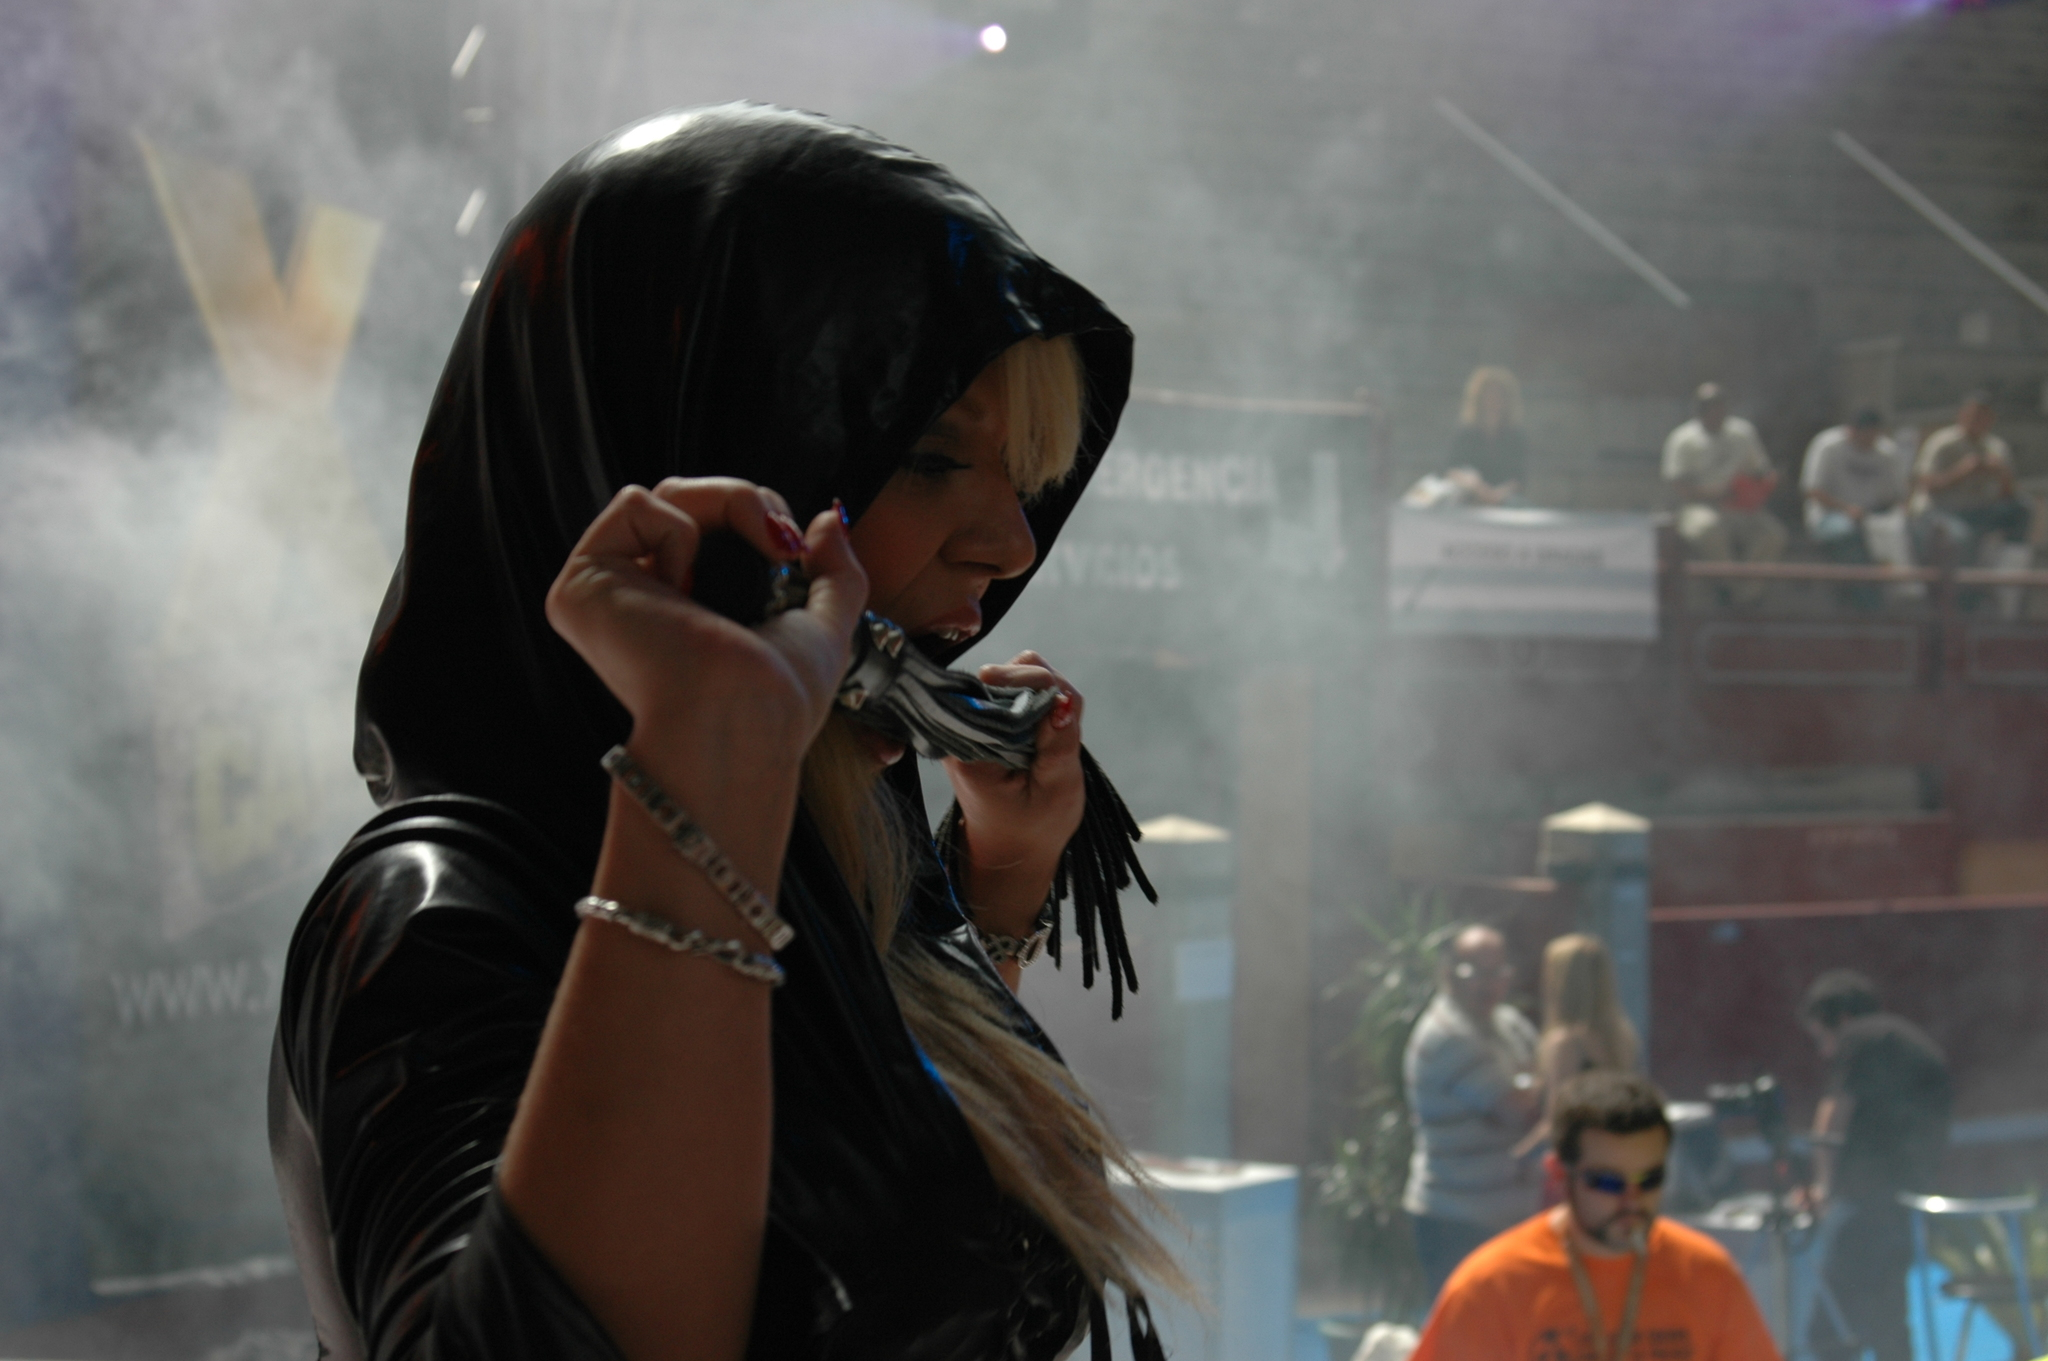 Imagen promocional de plataforma Vivex.tv.